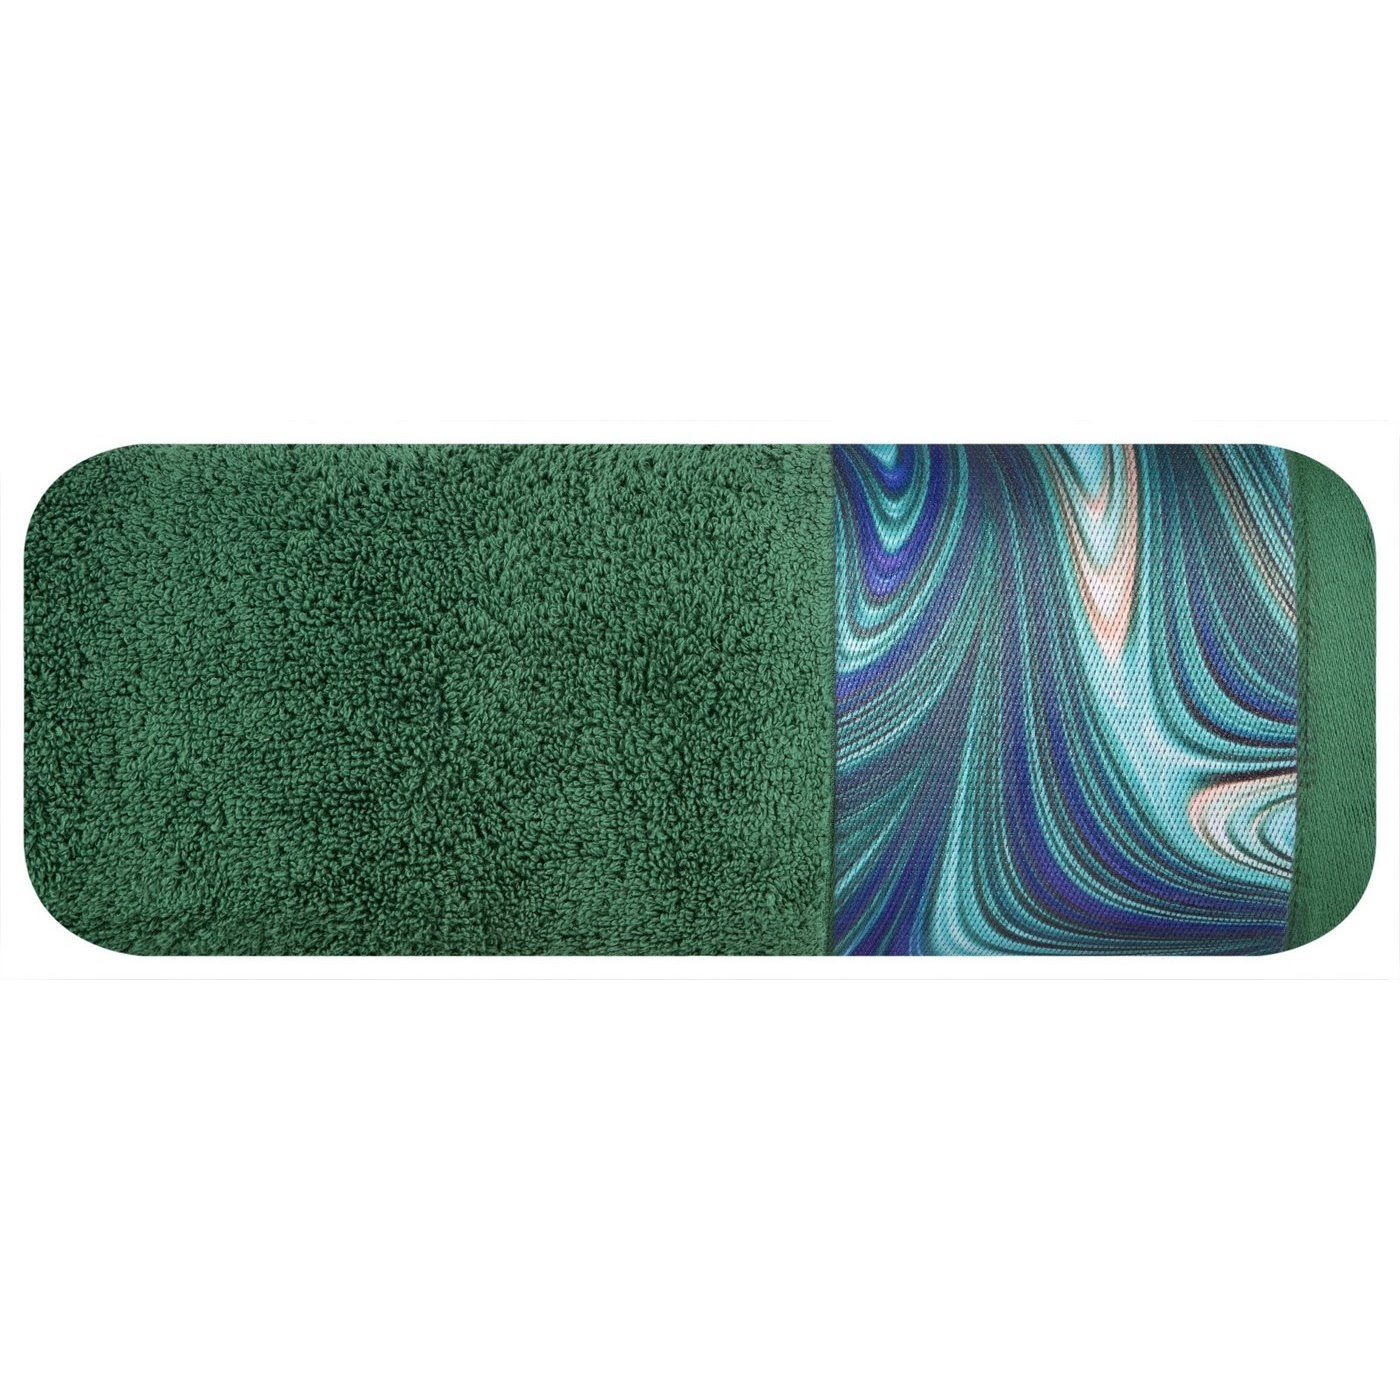 Prosop baie din bumbac Altai Eva Minge Verde inchis, 70 x 140 cm poza